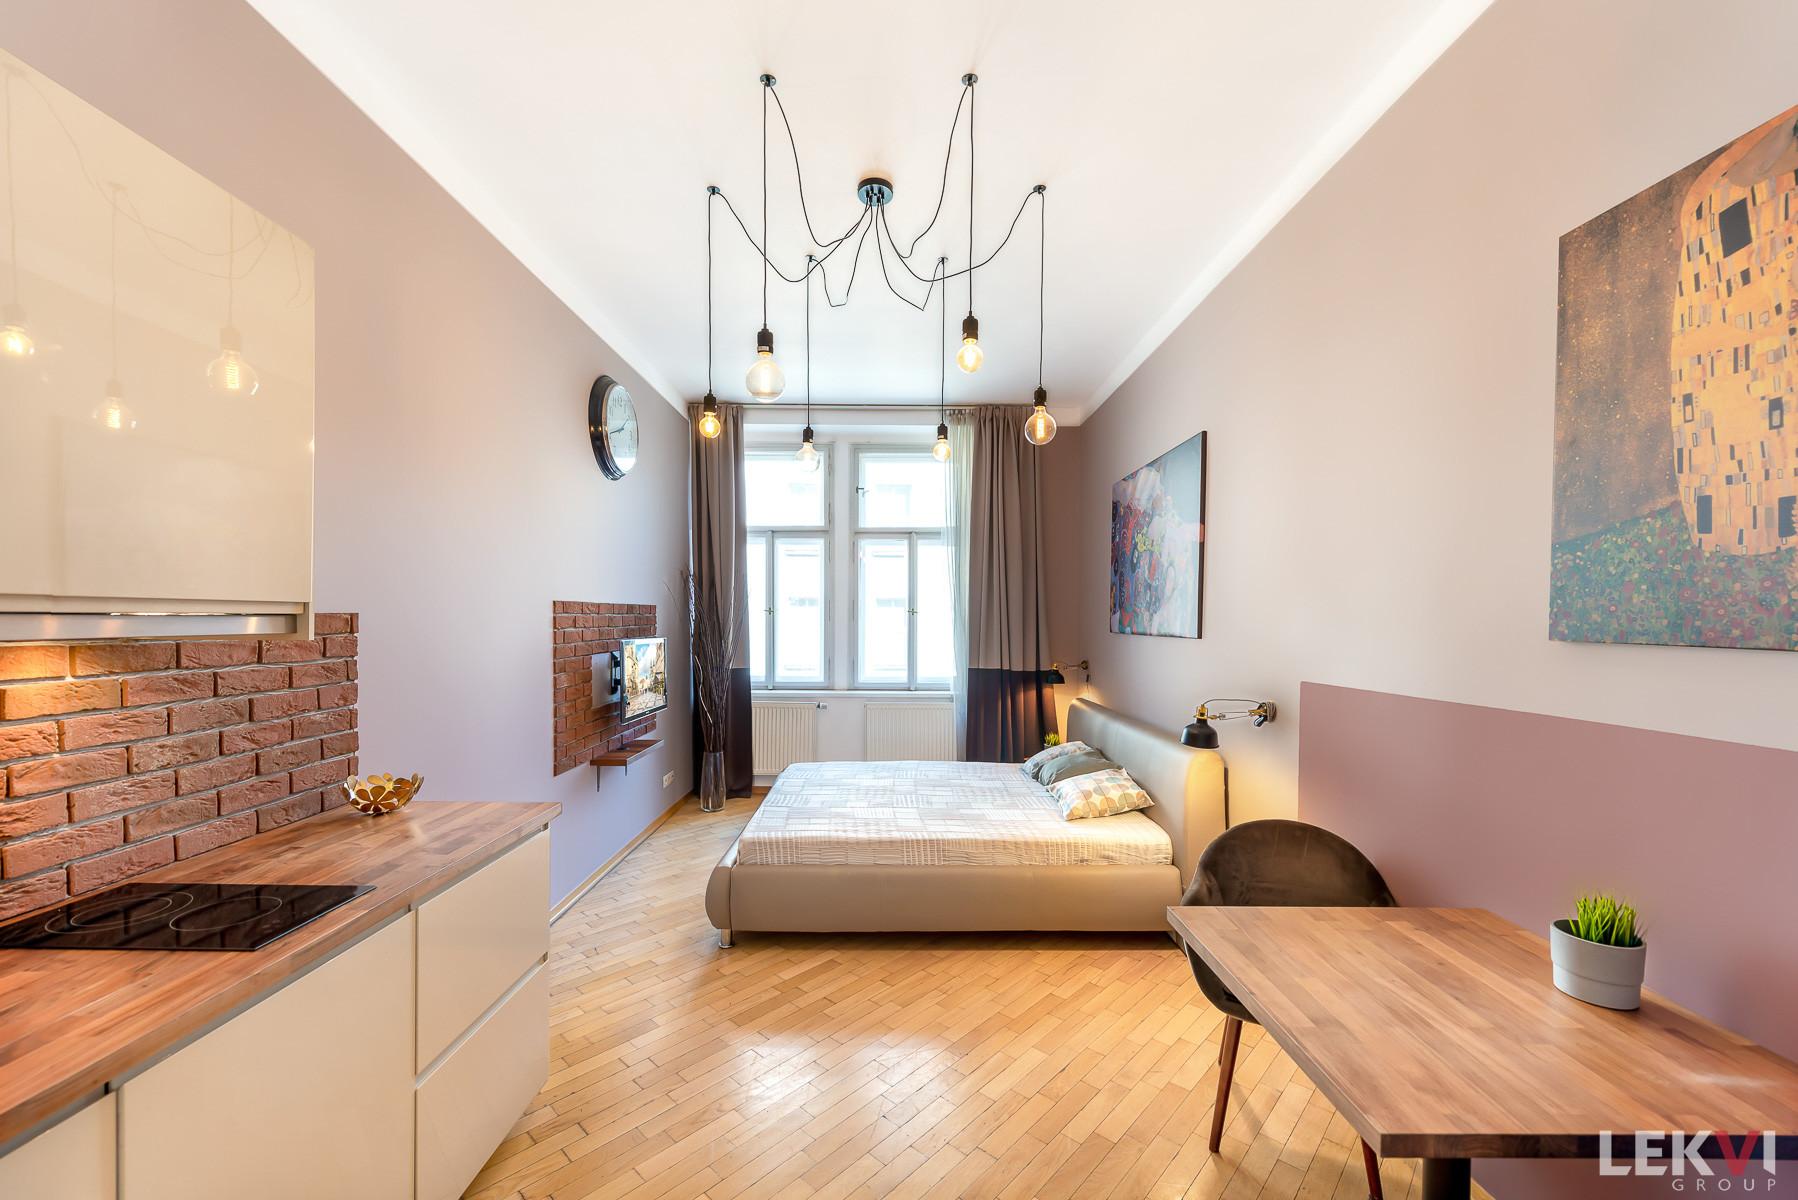 Prodej bytu 3+kk, 72 m2 - Klimentská, Praha 1